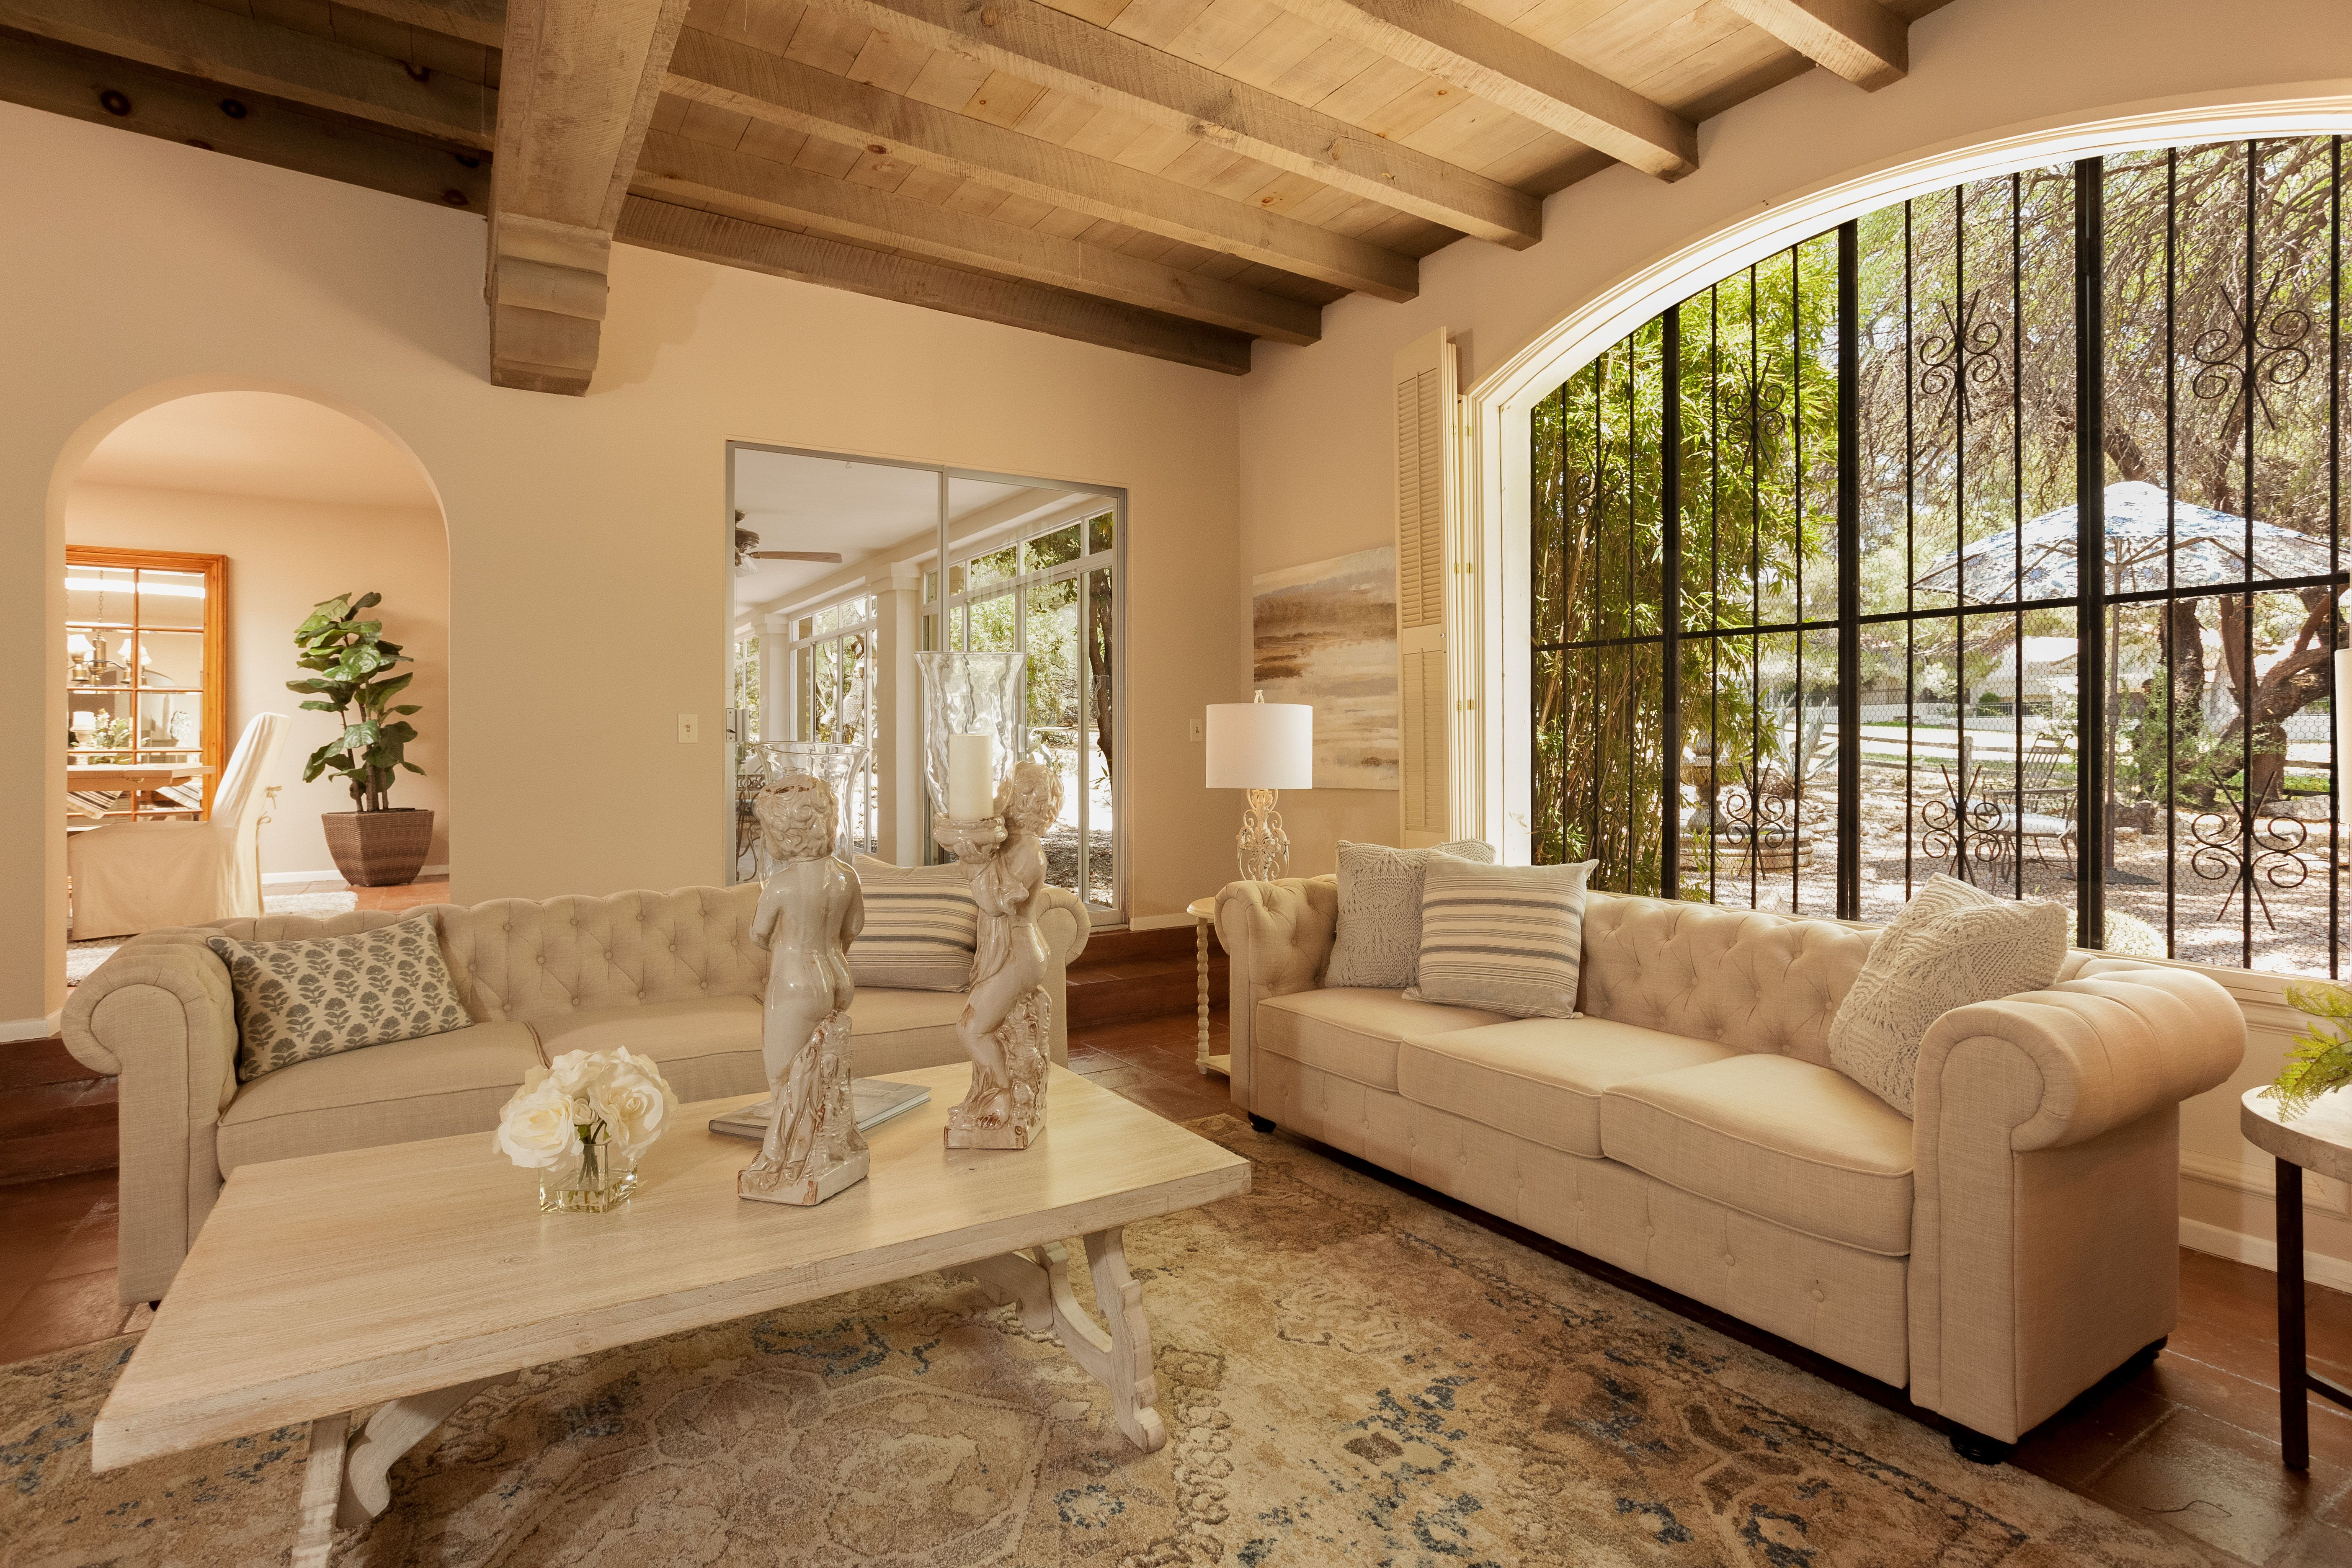 Family room in a hacienda foothills tucson az realestate thru